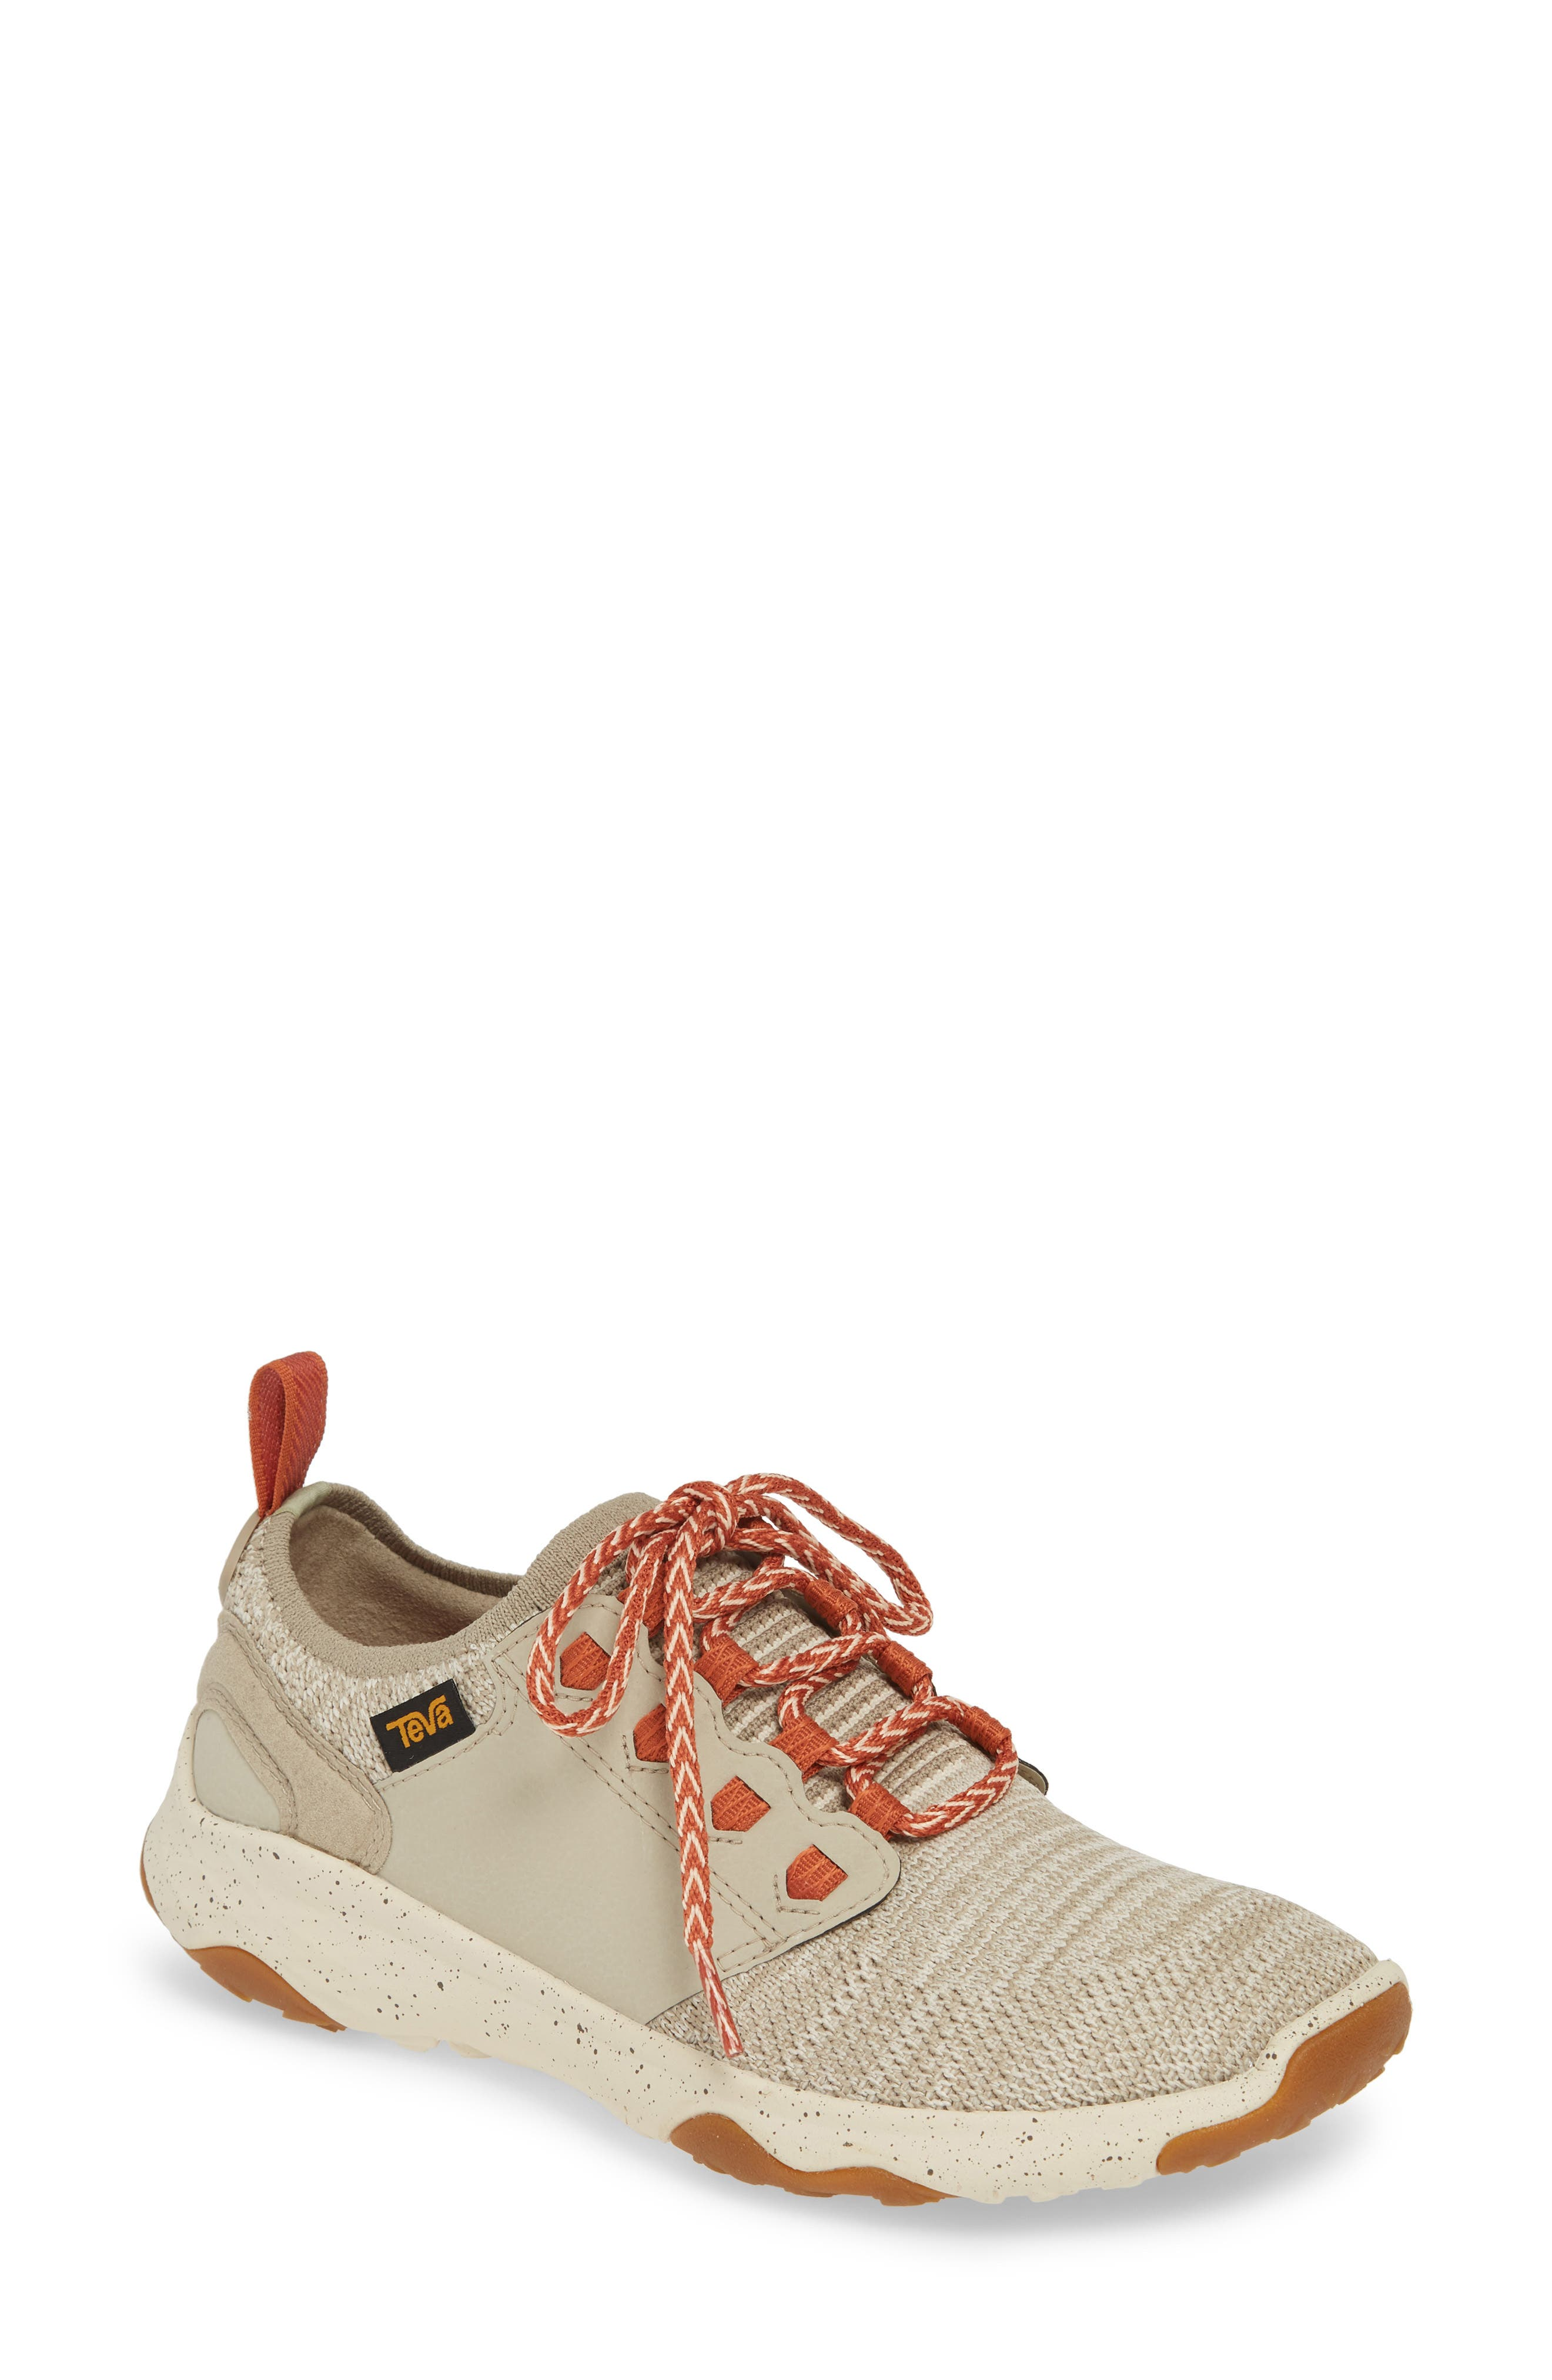 Teva Arrowood 2 Waterproof Knit Sneaker